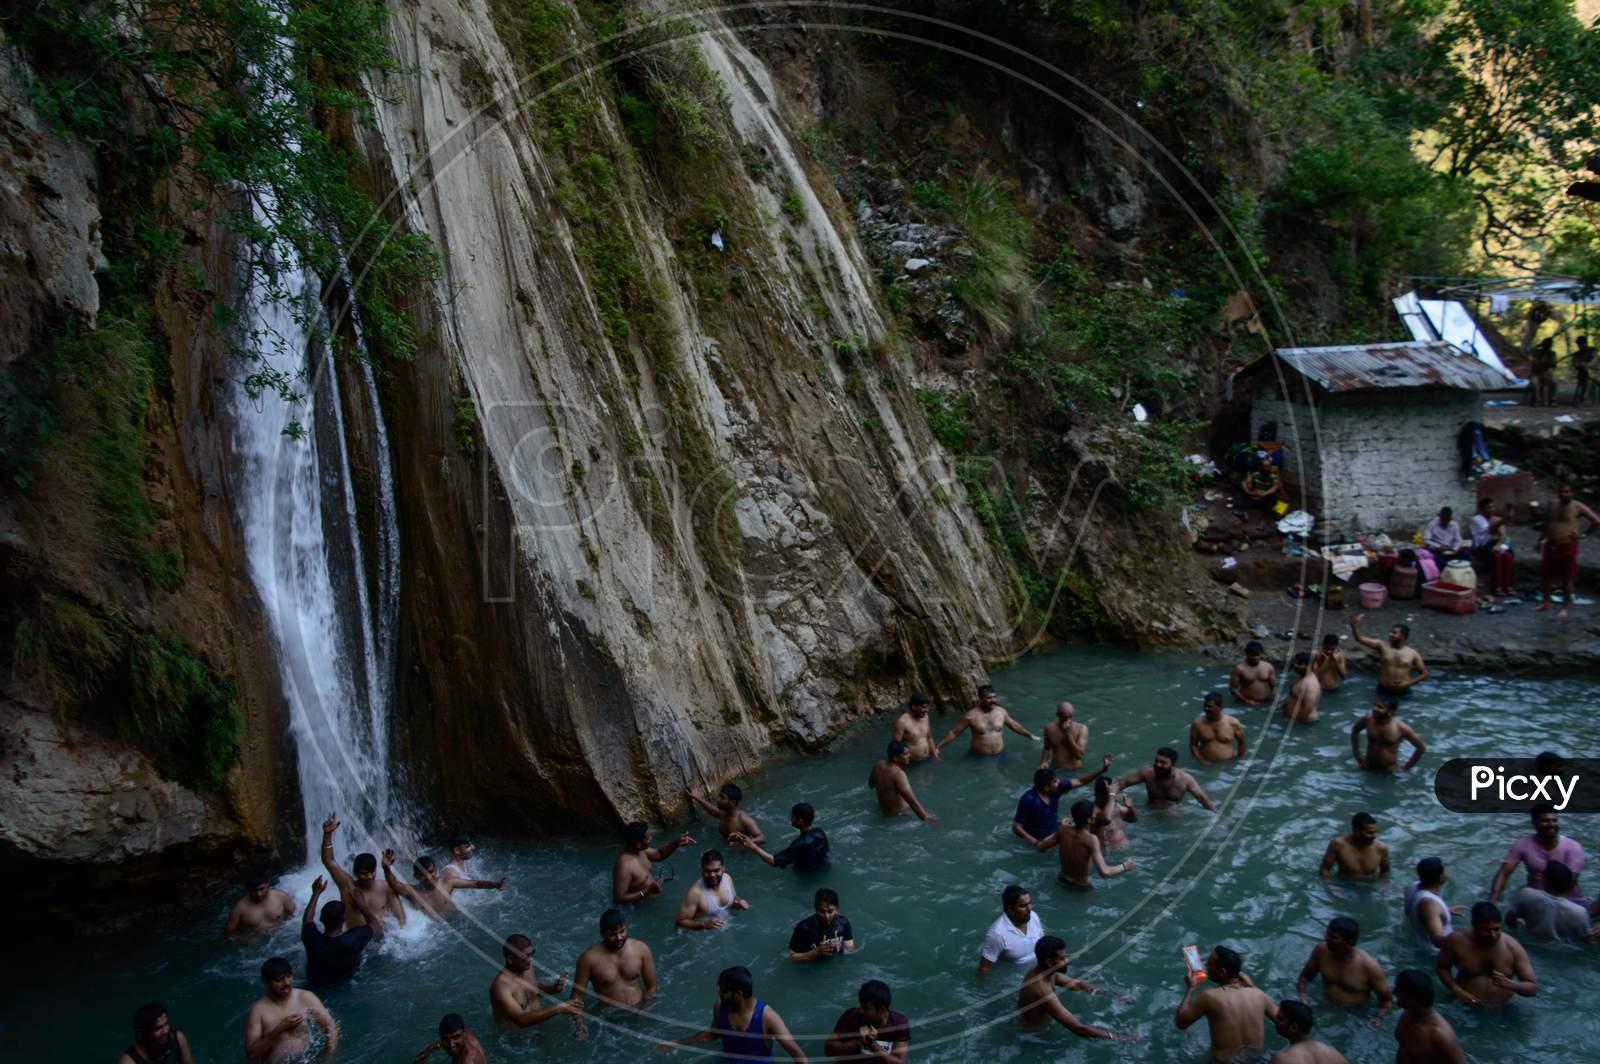 Group Of People Enjoying Under The Famous Neer Garh Waterfall, Rishikesh, Uttarakhand India.